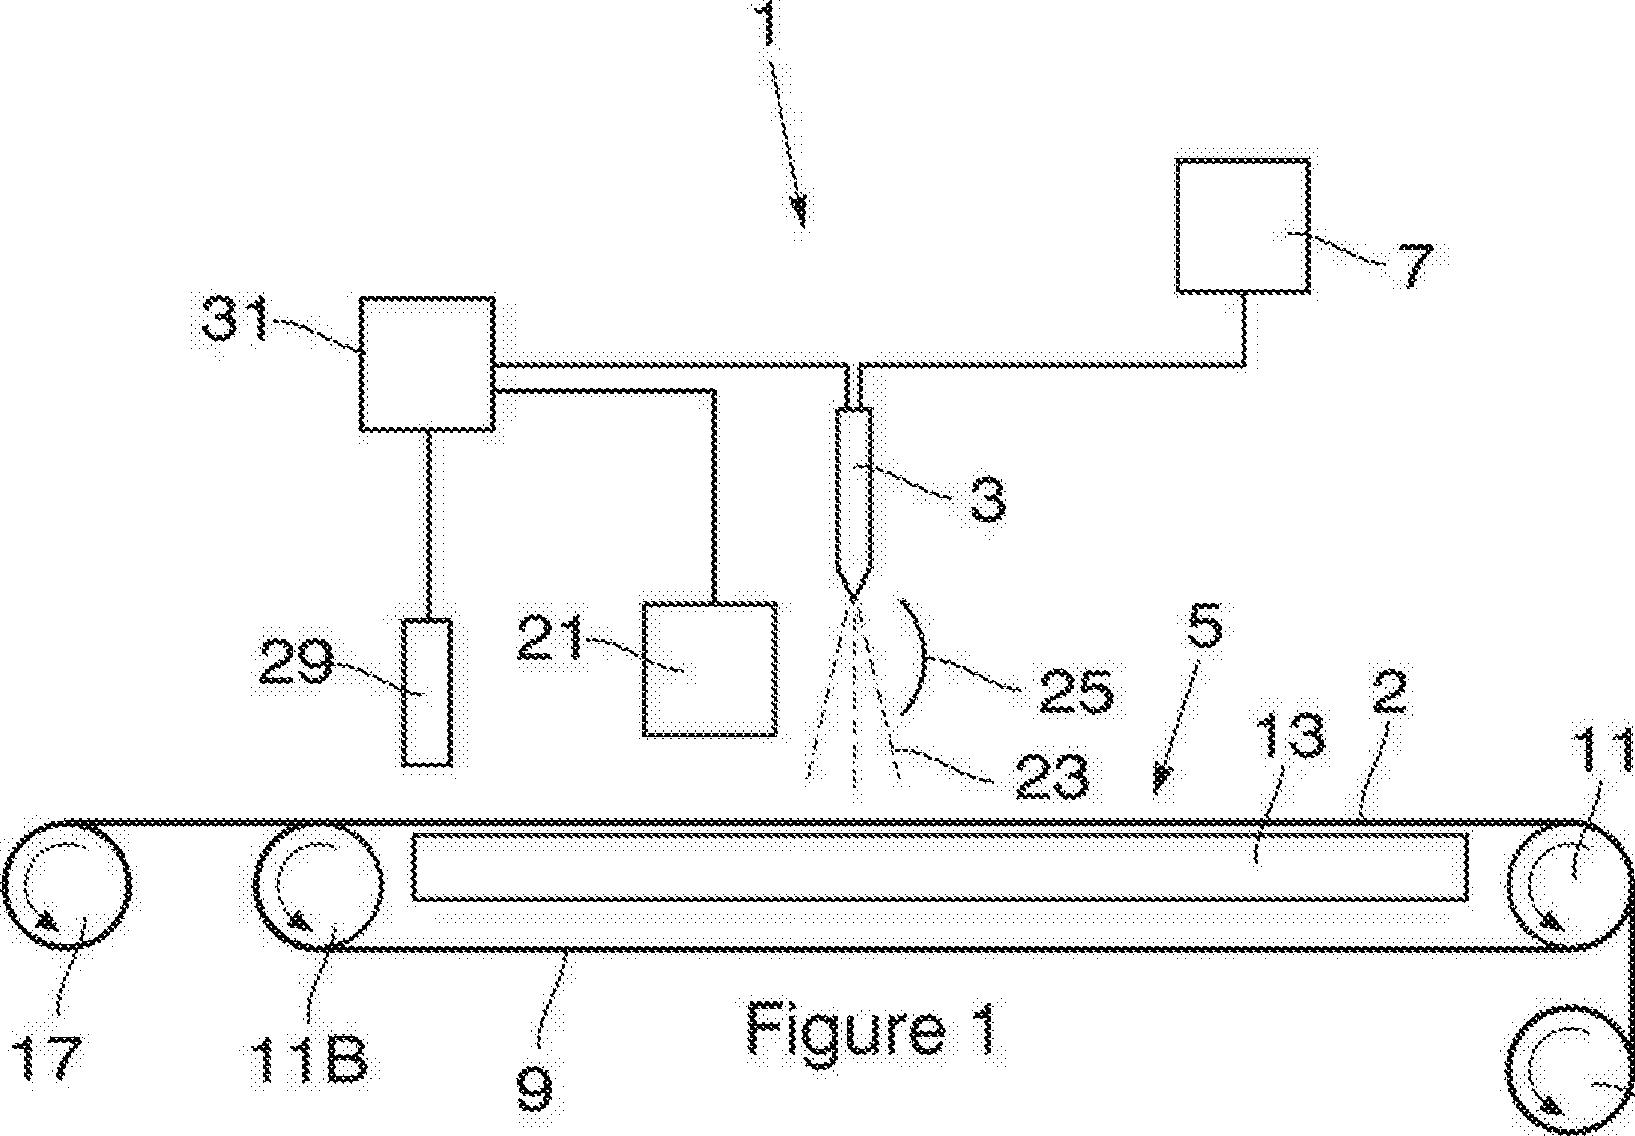 Figure GB2555125A_D0003